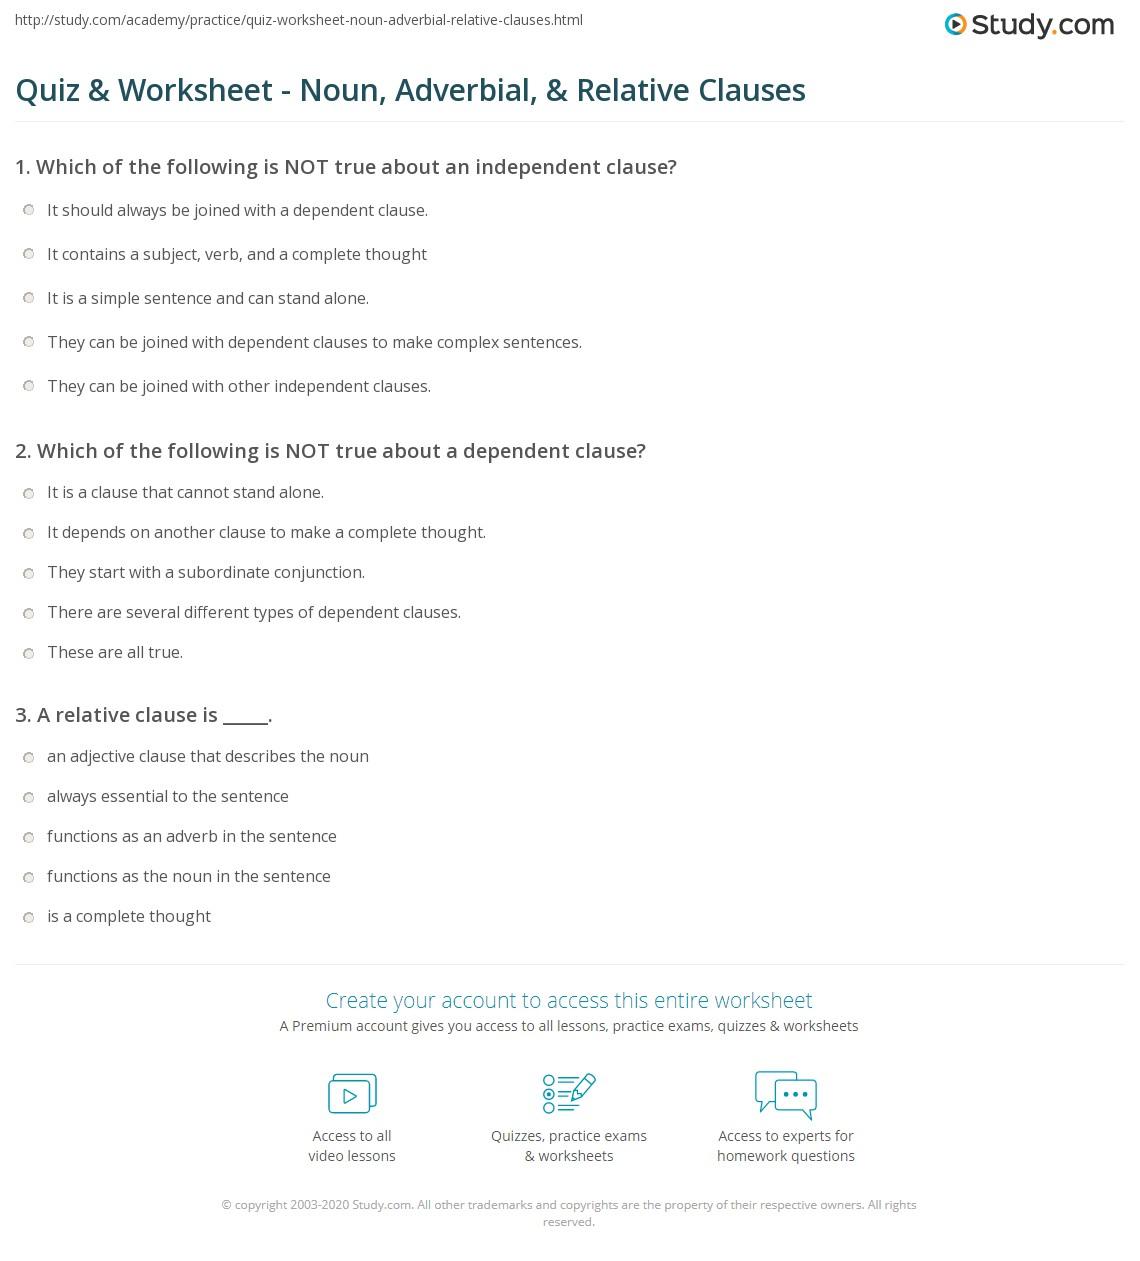 quiz worksheet noun adverbial relative clauses. Black Bedroom Furniture Sets. Home Design Ideas